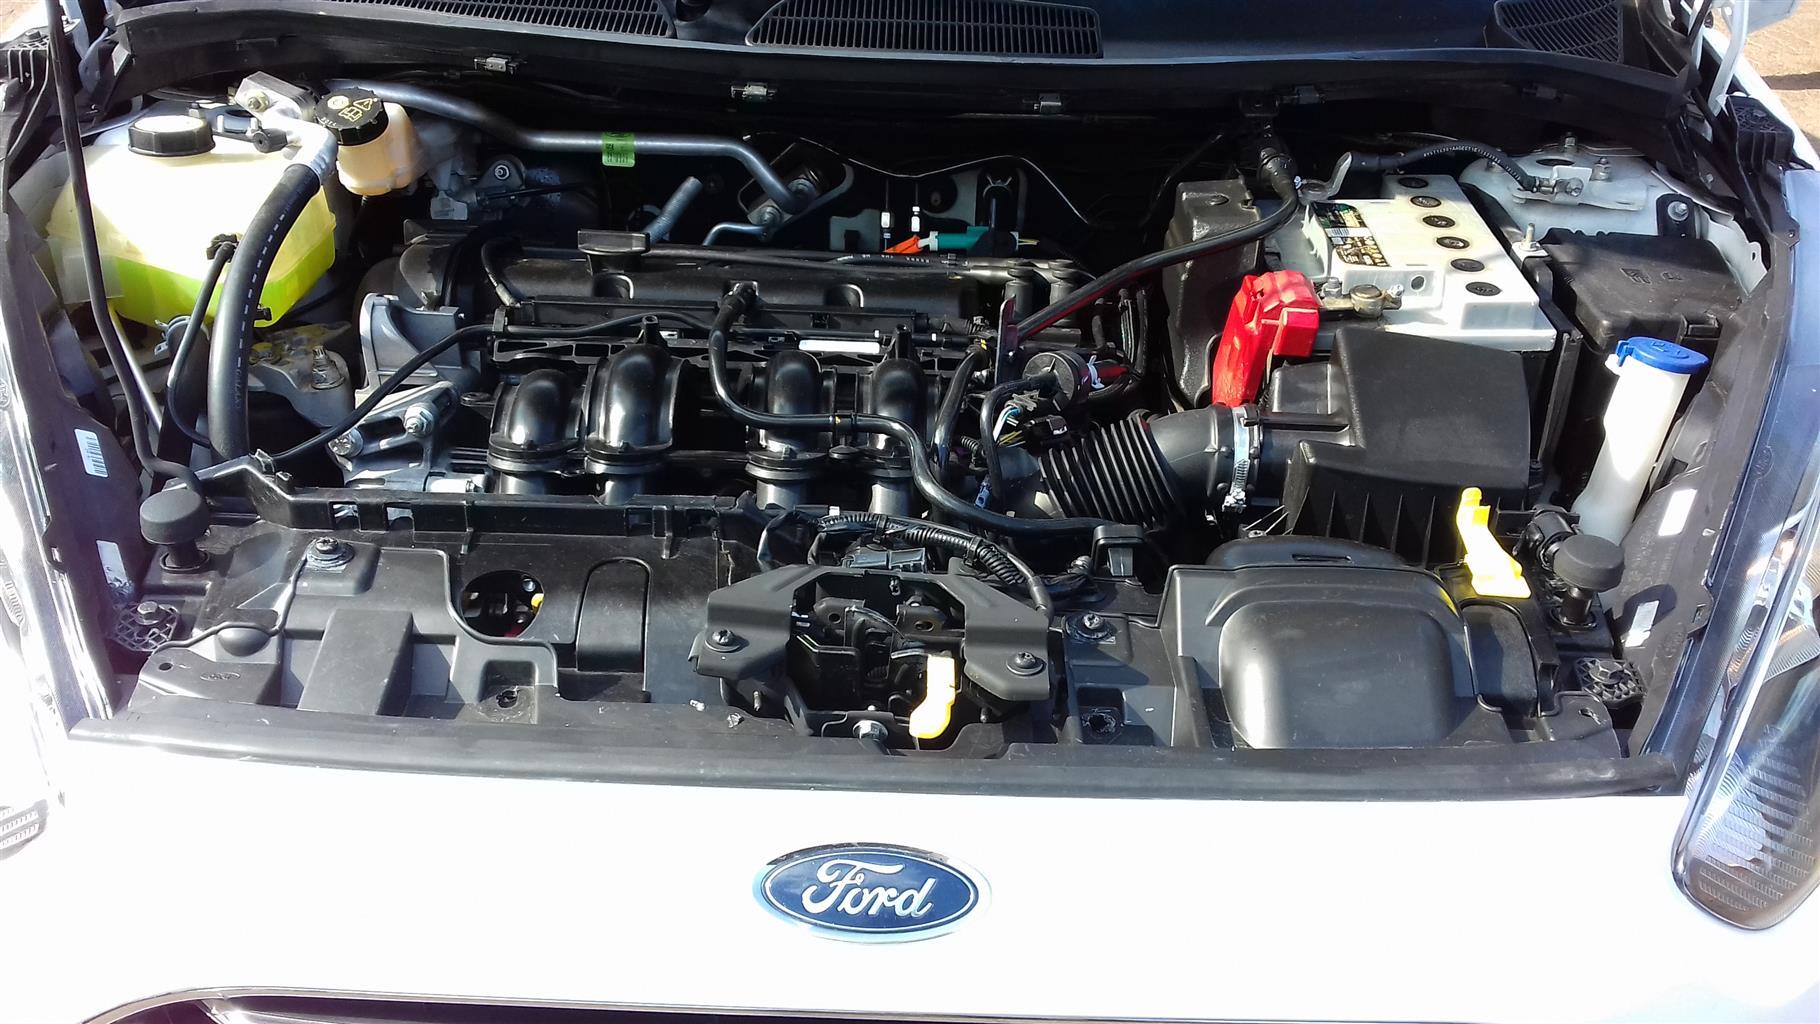 2016 Ford Fiesta 1.6 5 door Ambiente